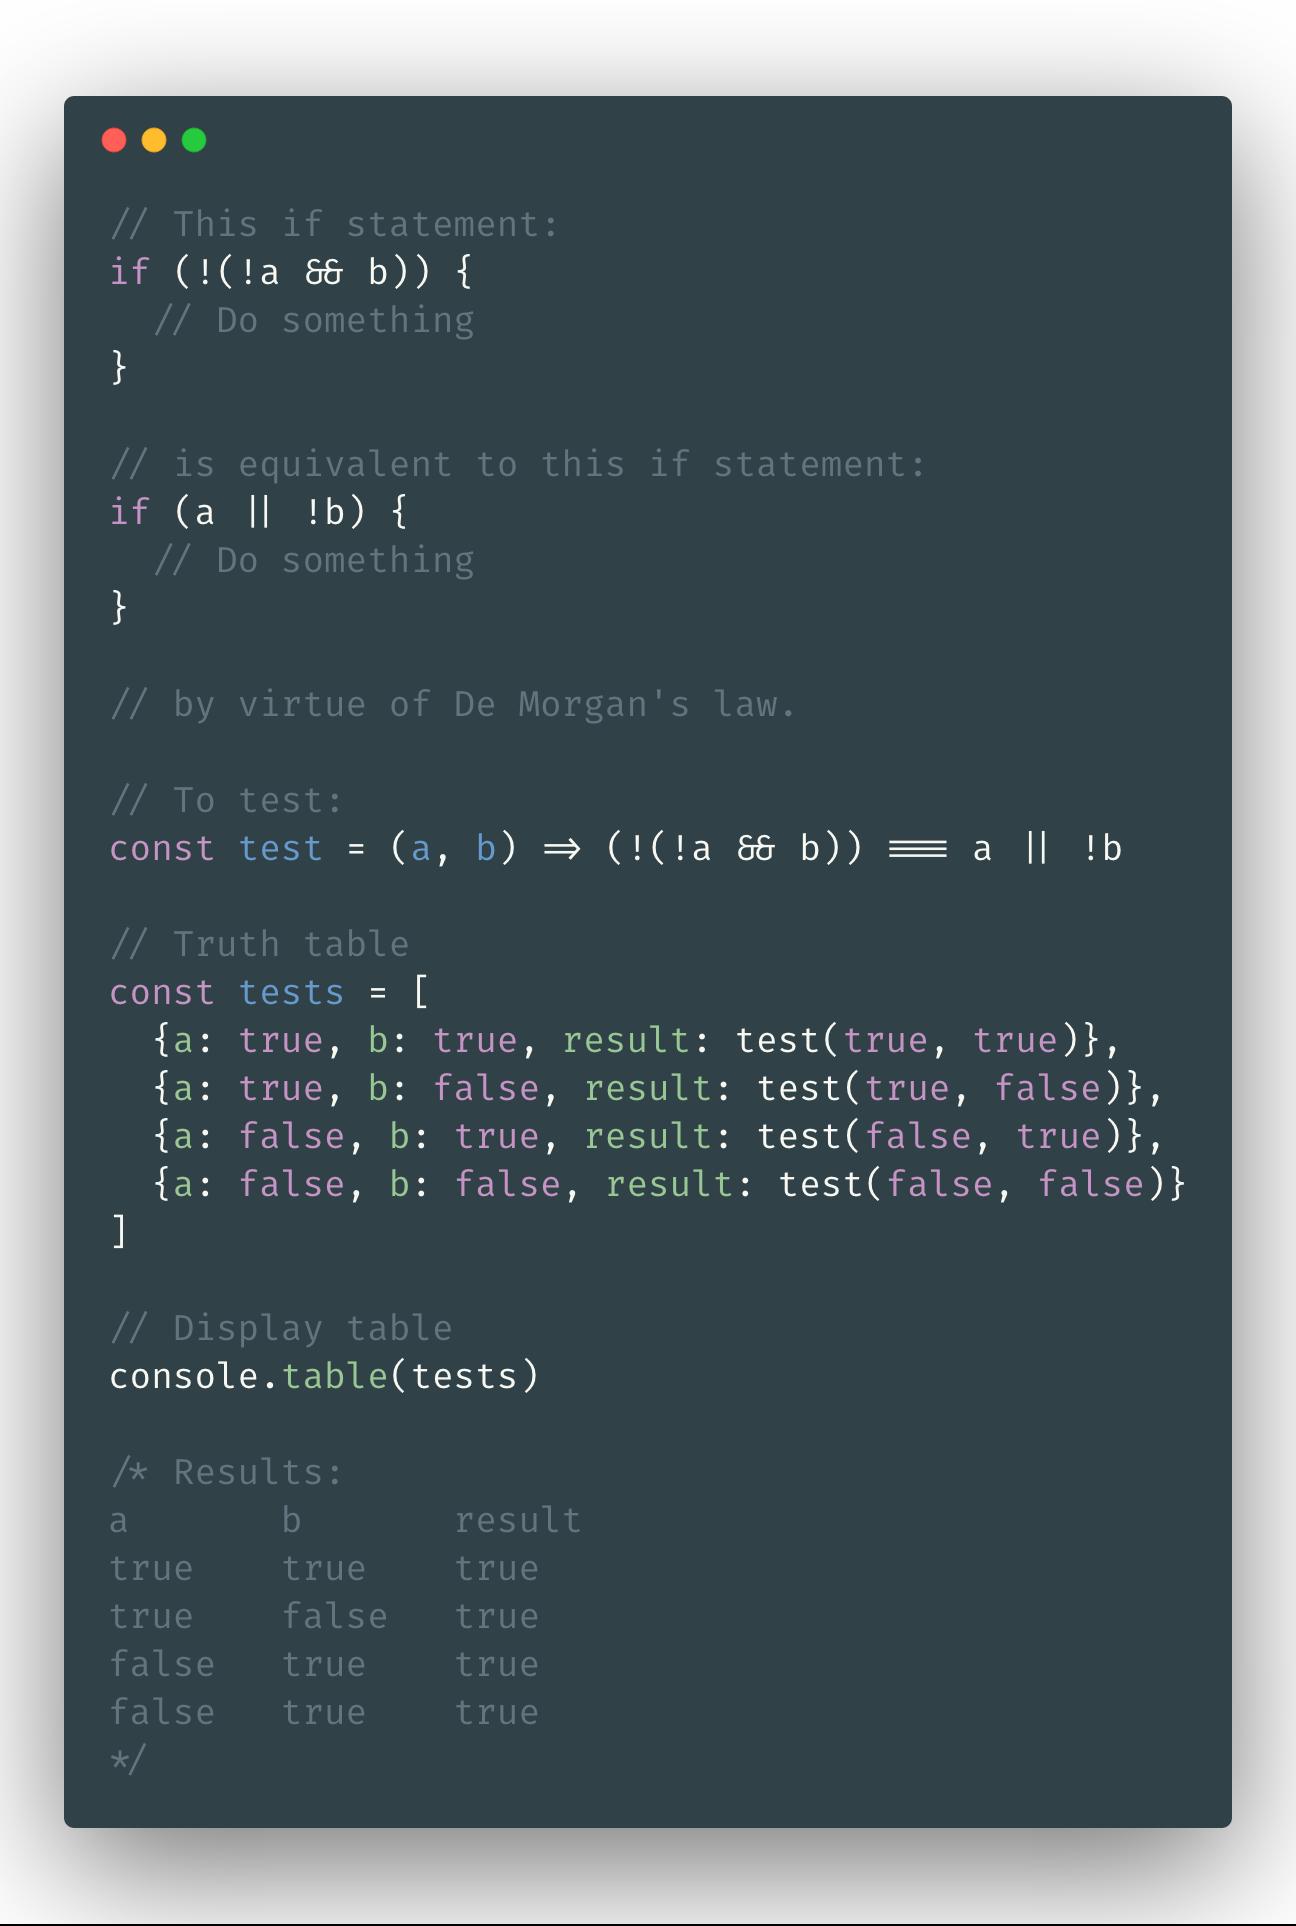 De Morgan's code